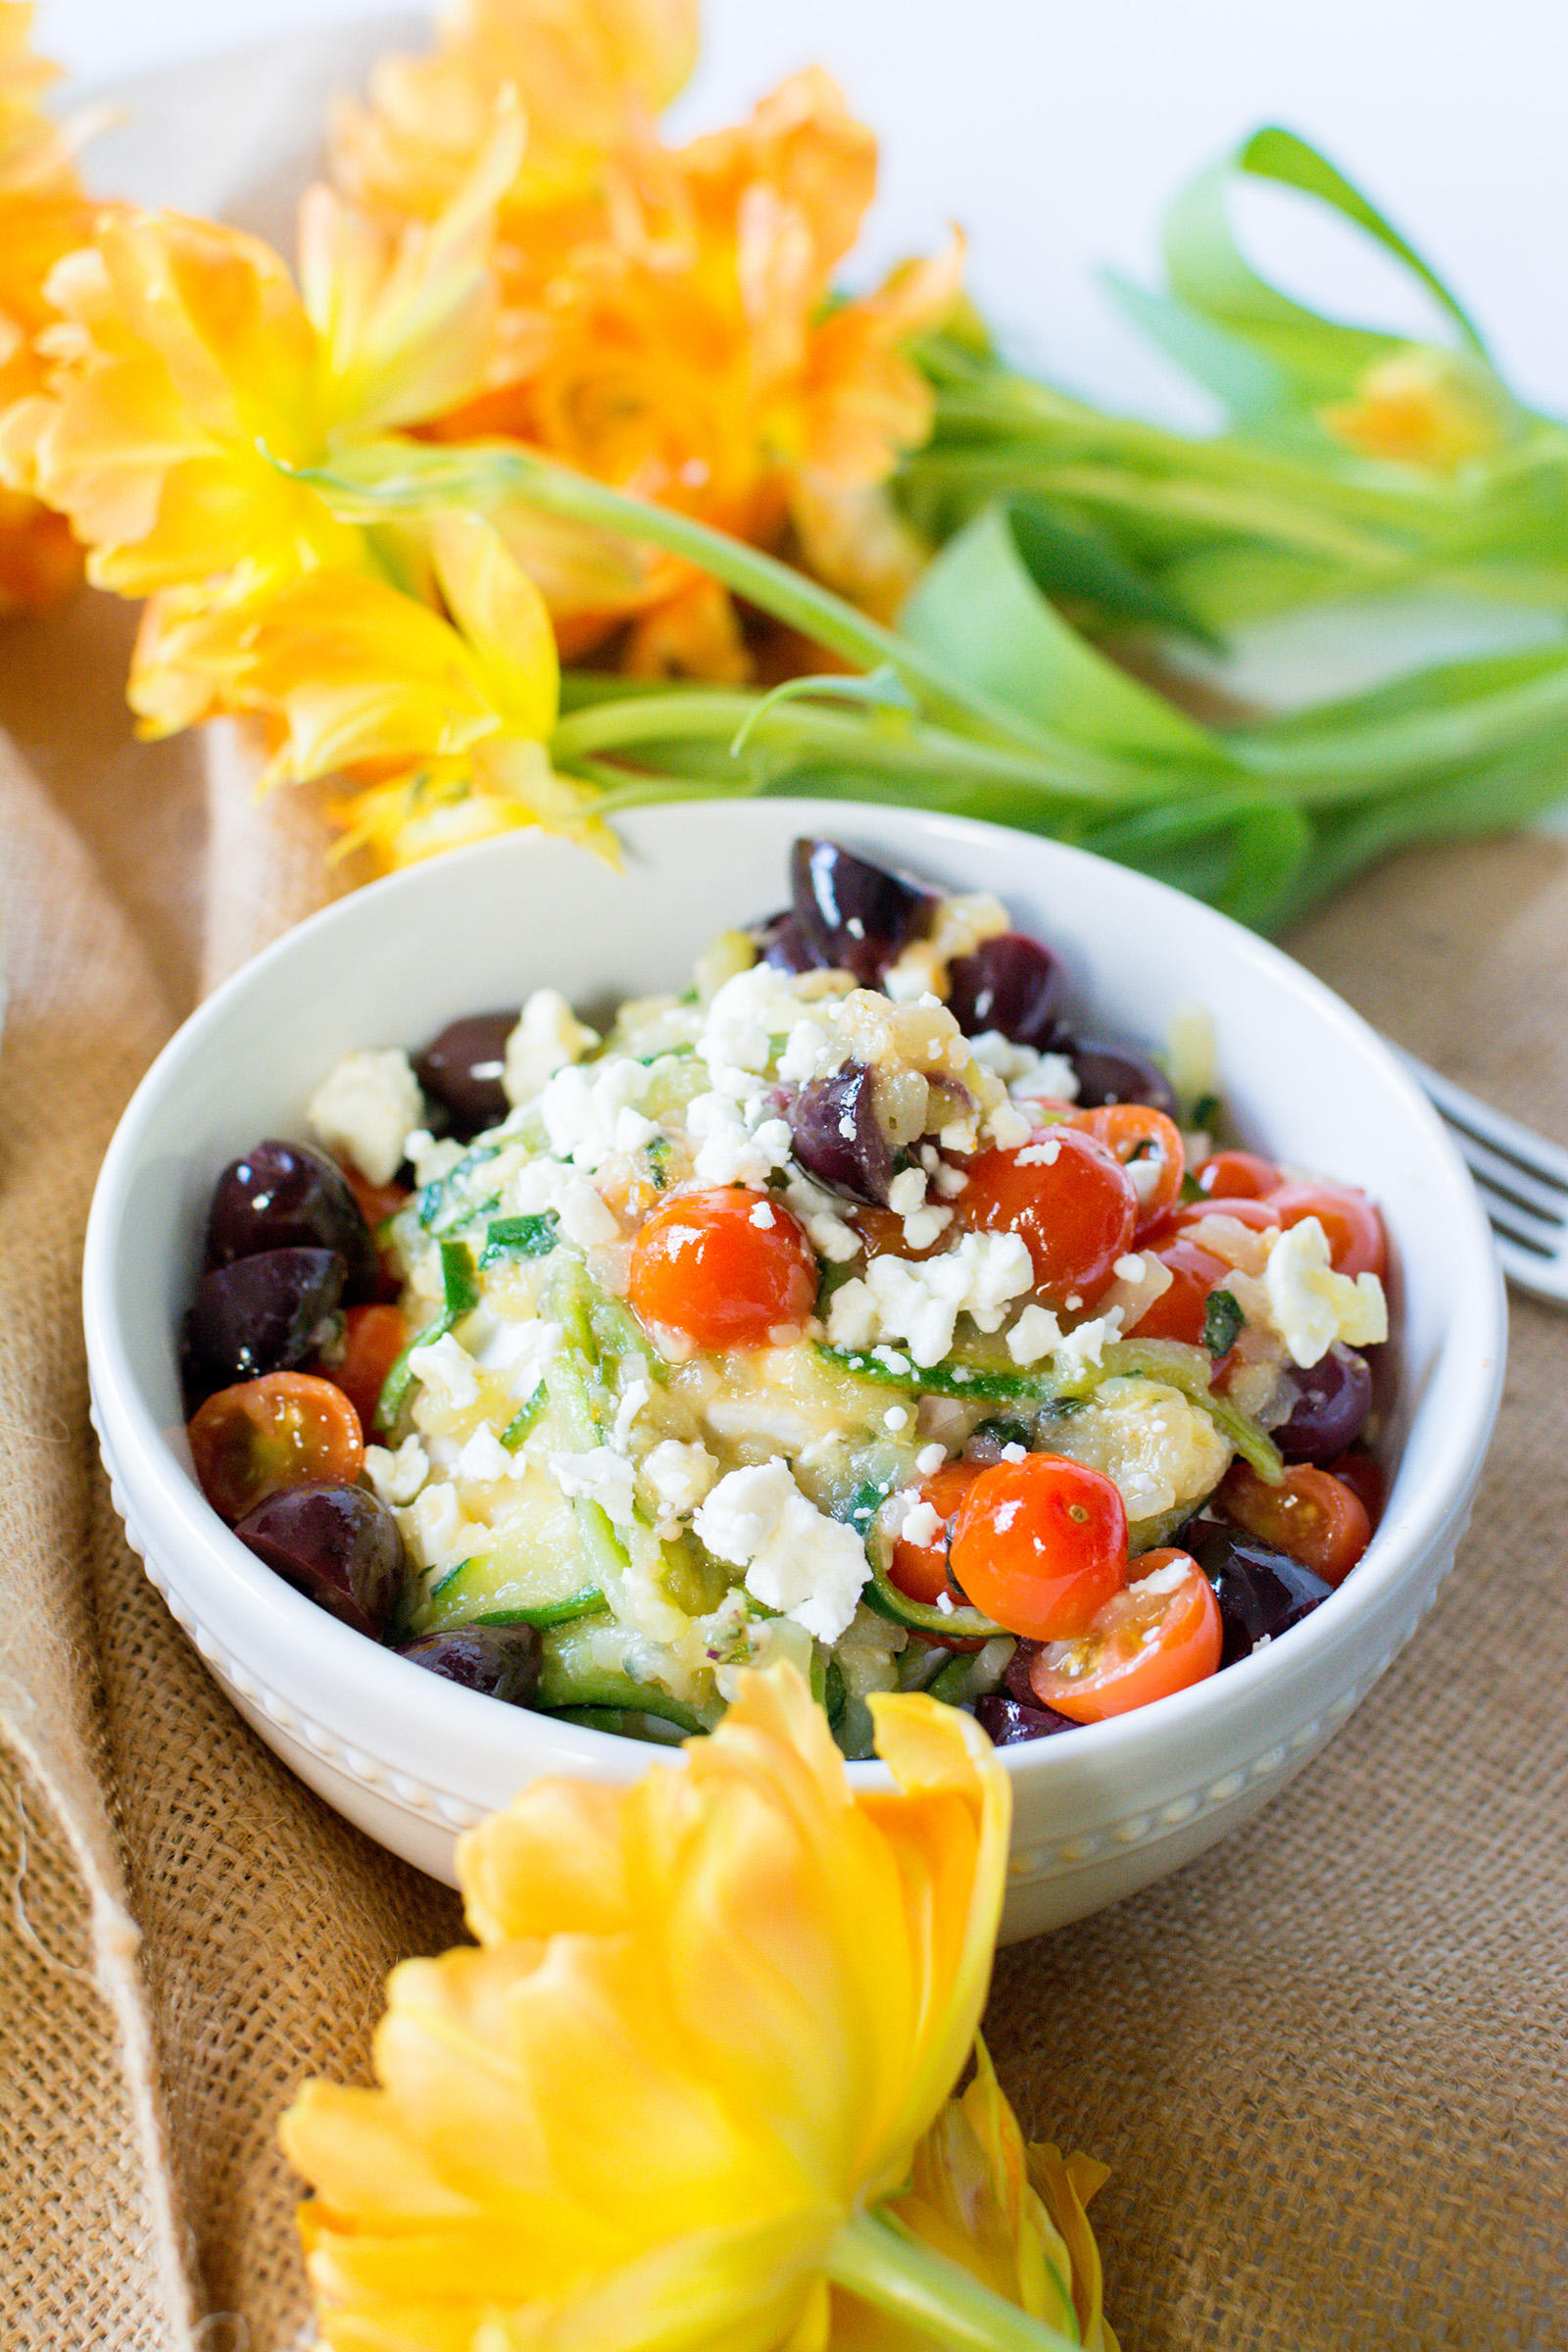 Low-Carb Tomato Olive Feta Zoodles Recipe